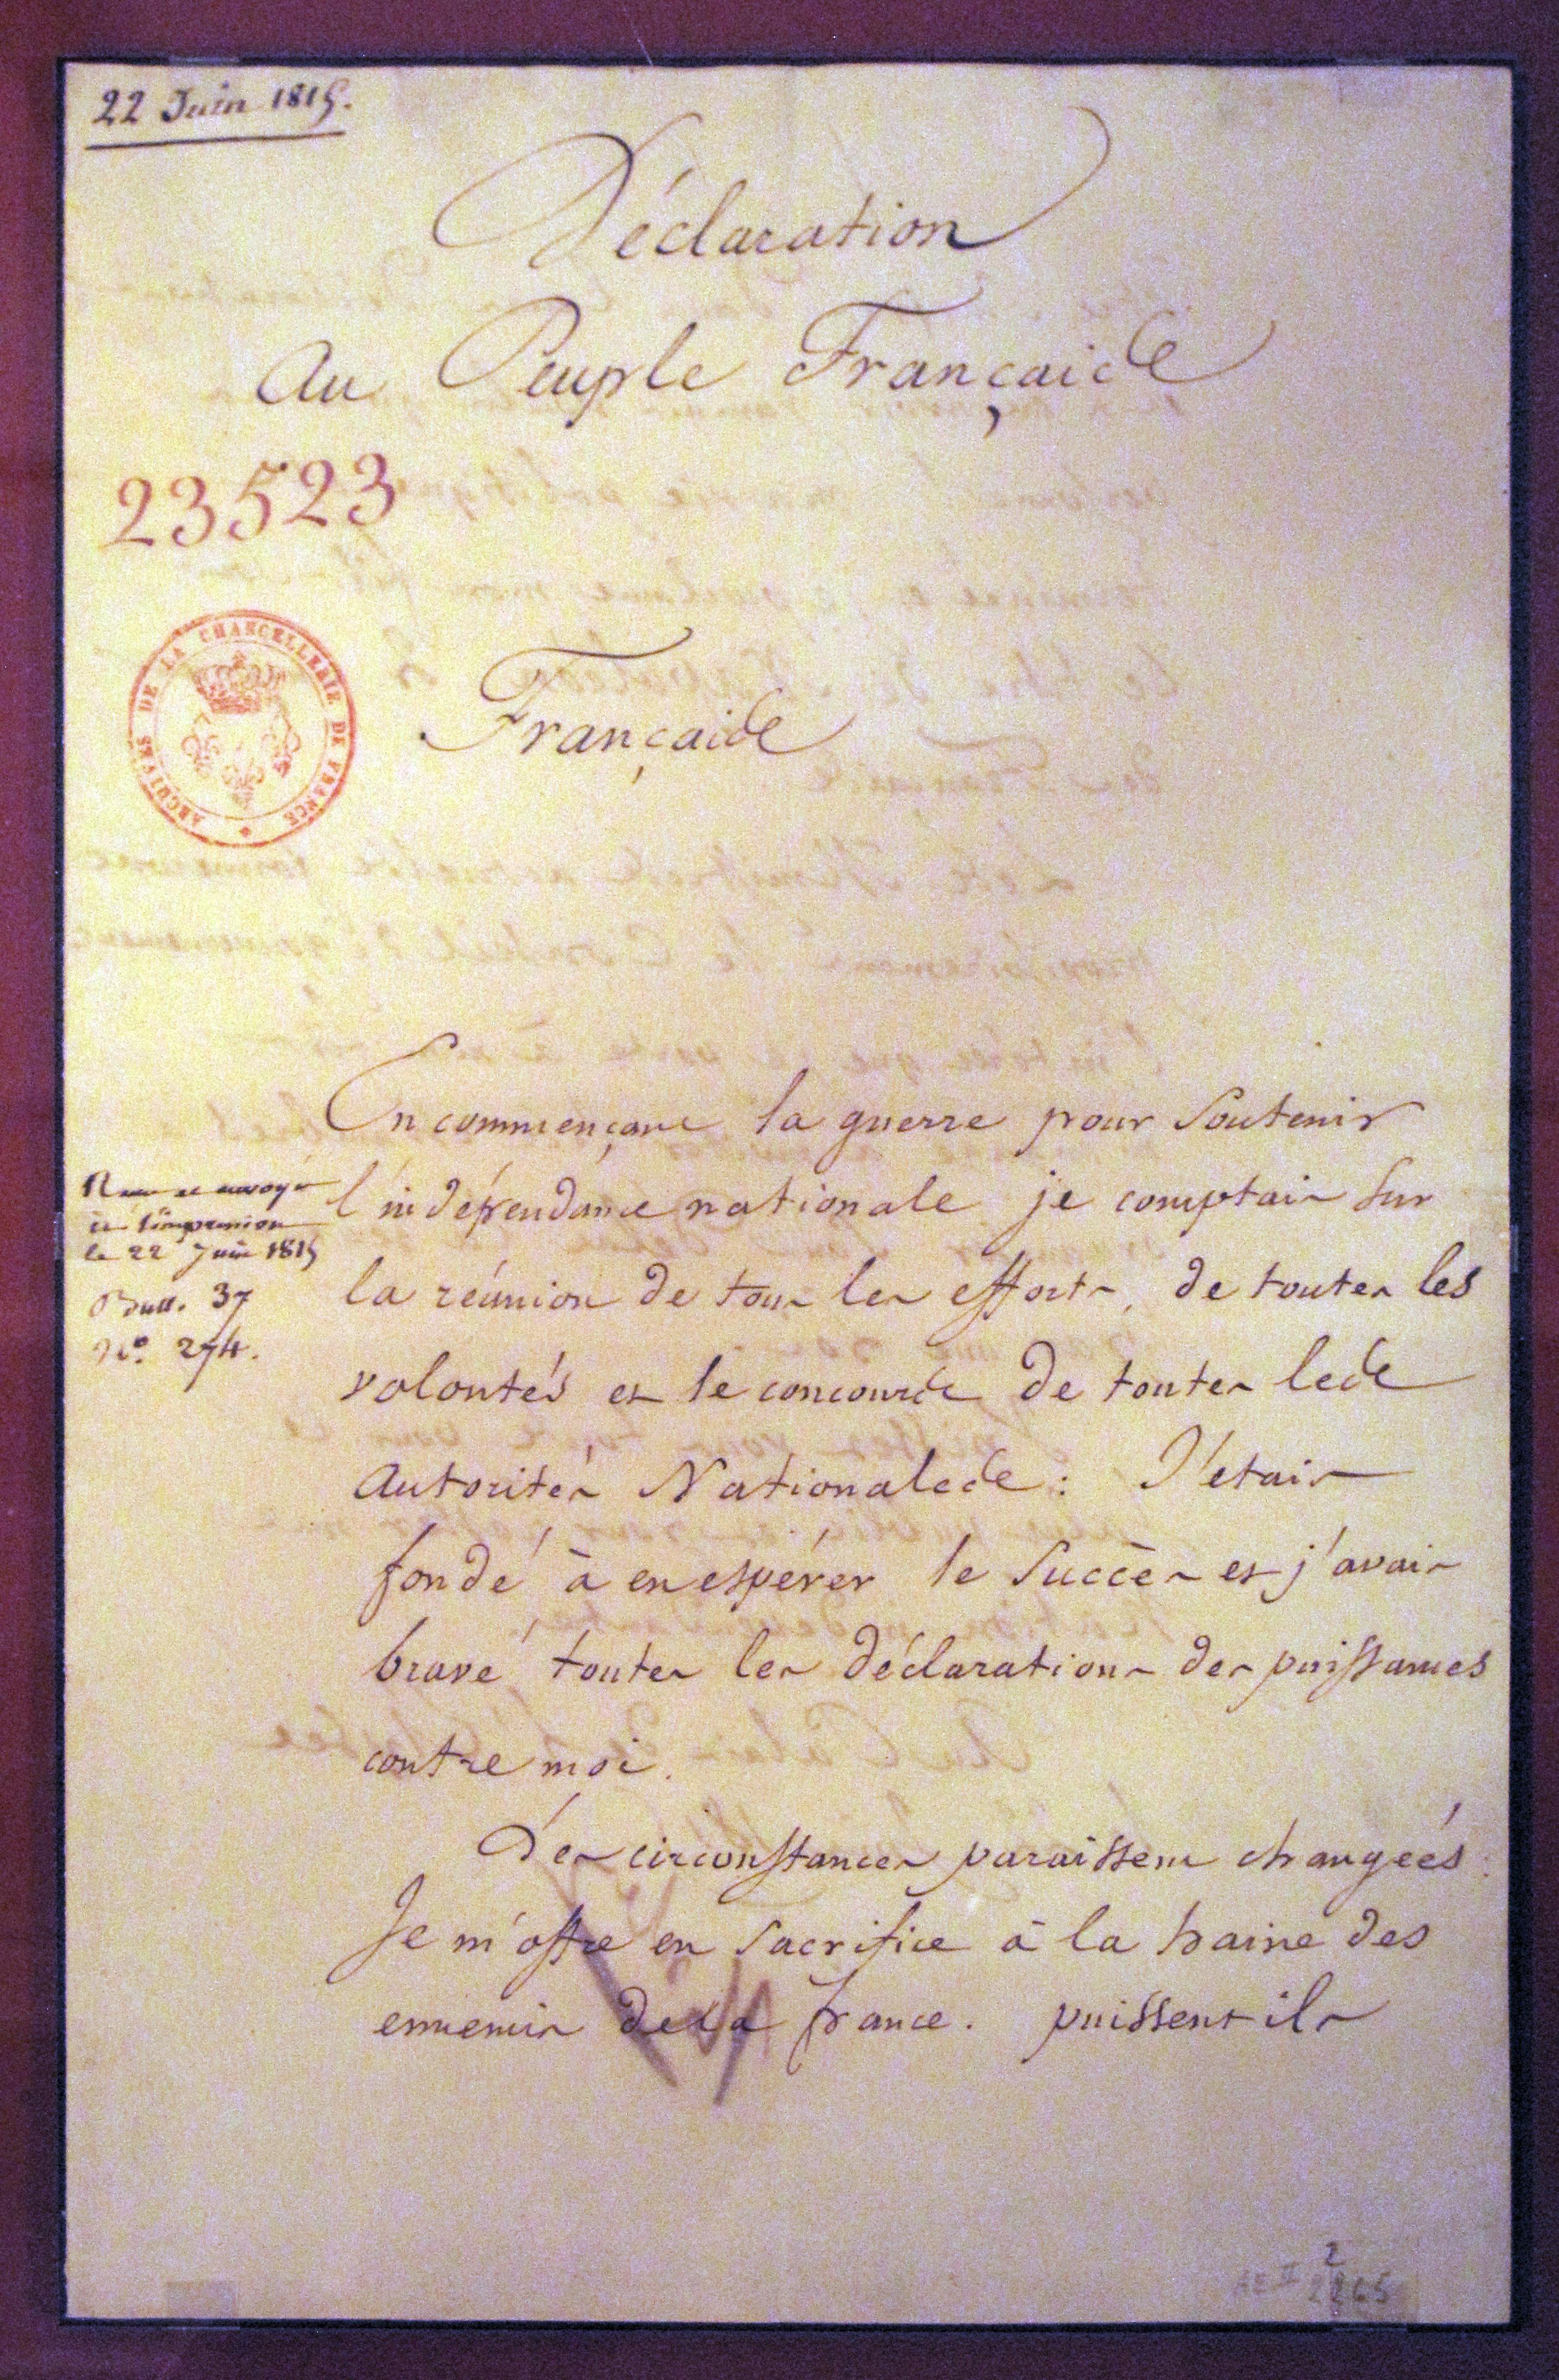 Second_abdication_act_of_Napoleon-IMG_0525.JPG